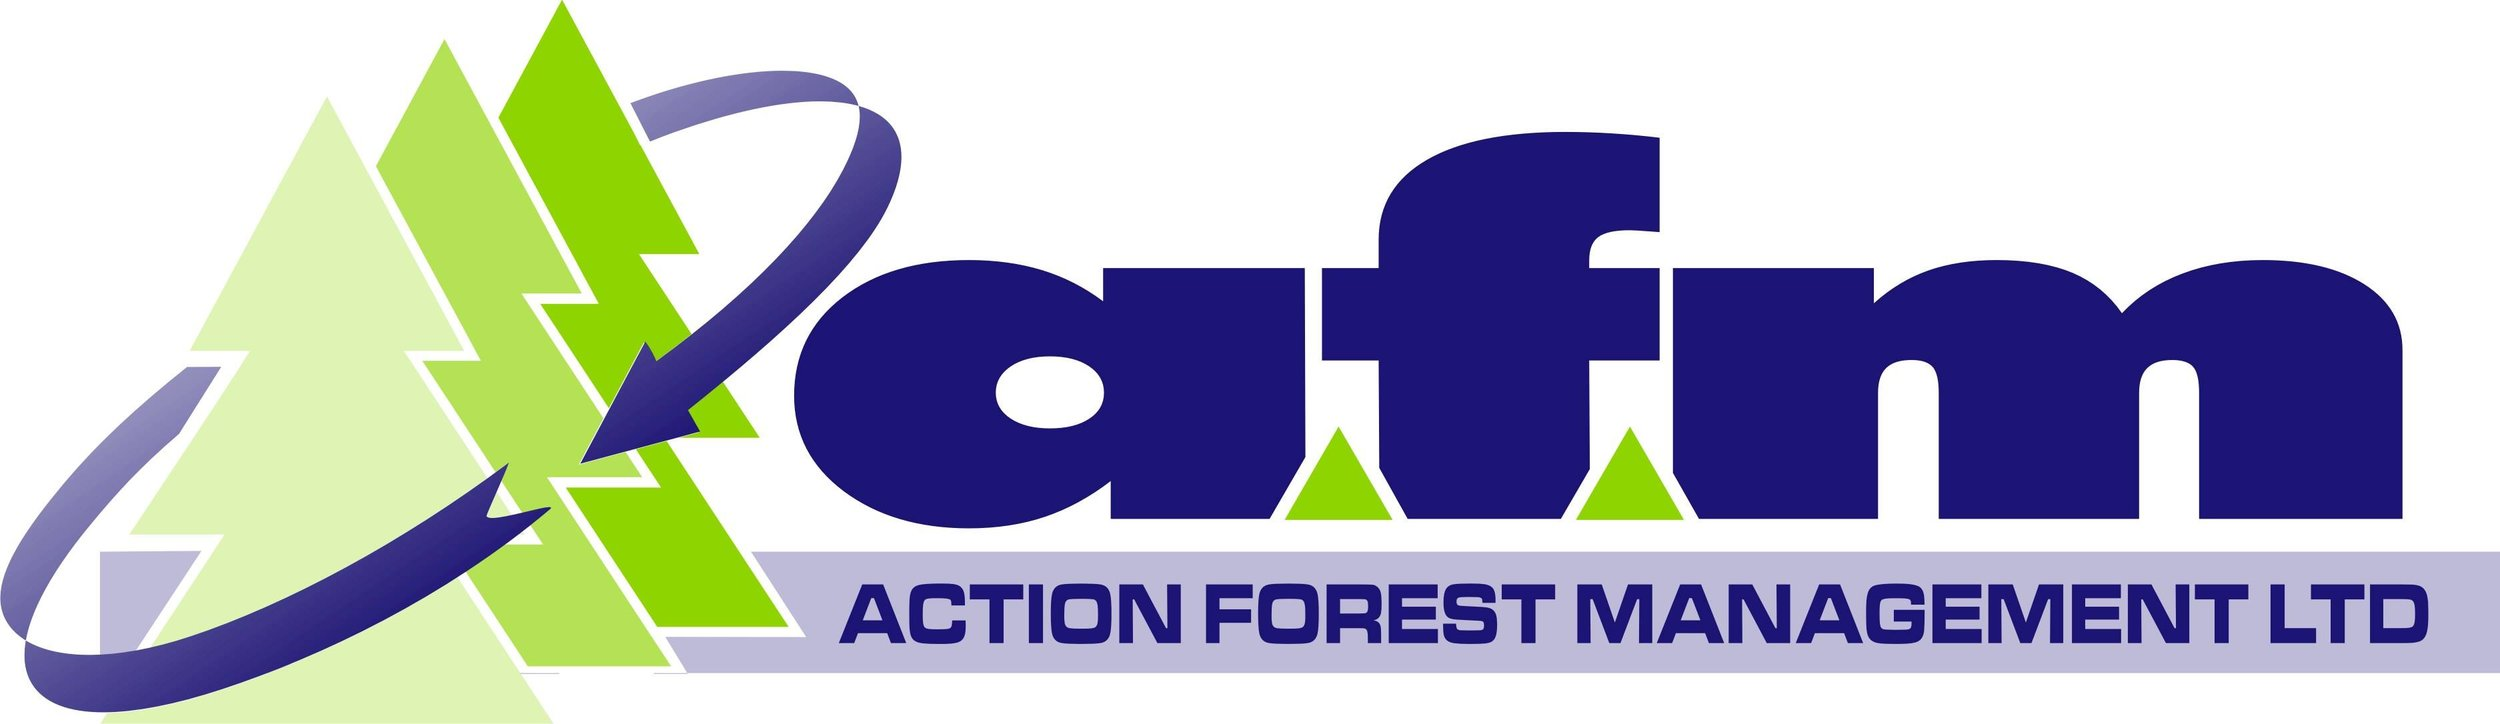 Action Forest Management.jpg